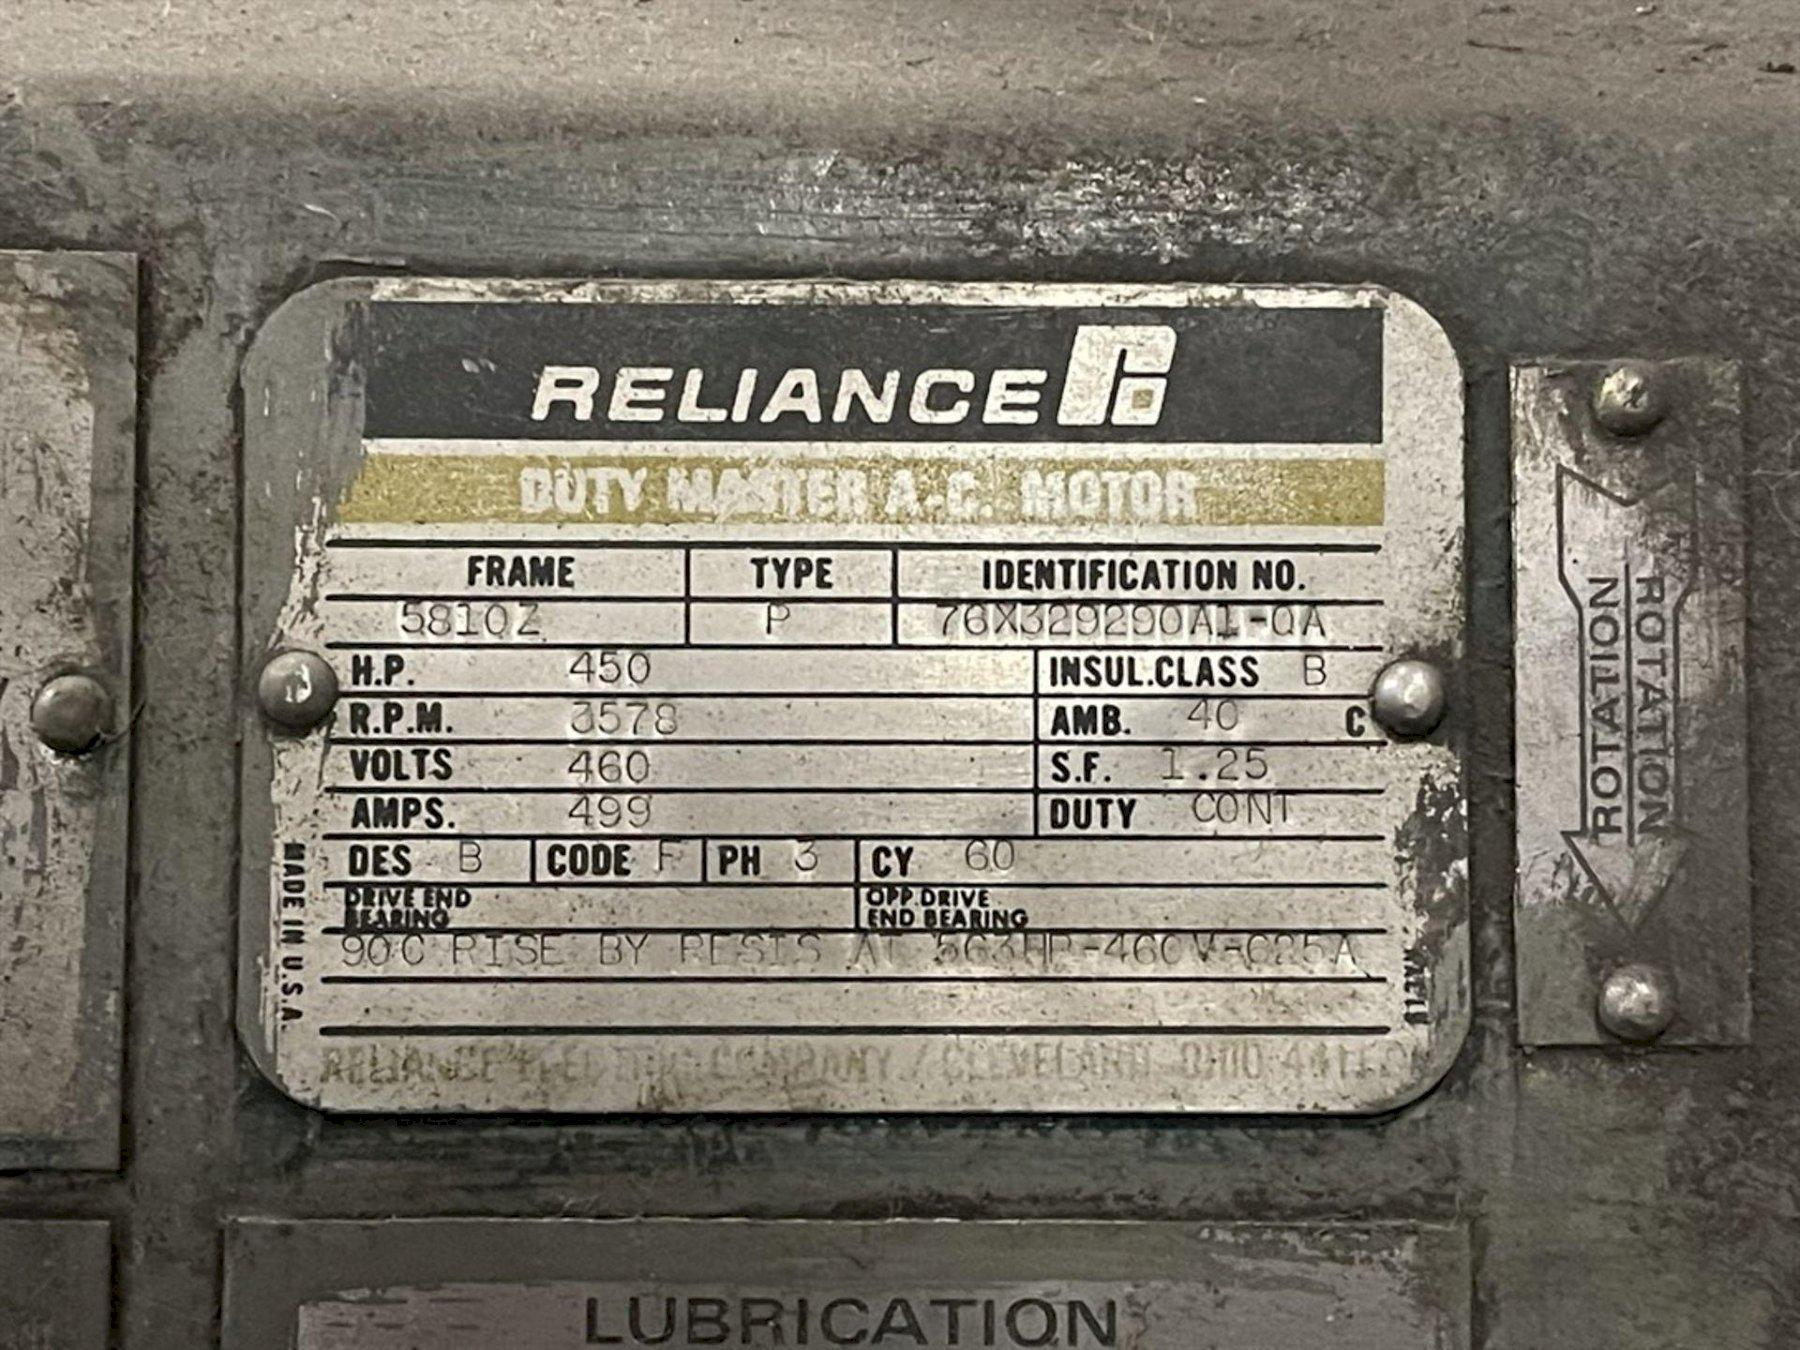 450 HP INGERSOLL RAND CENTAC CENTRIFUGAL AIR COMPRESSOR. STOCK # 0526021